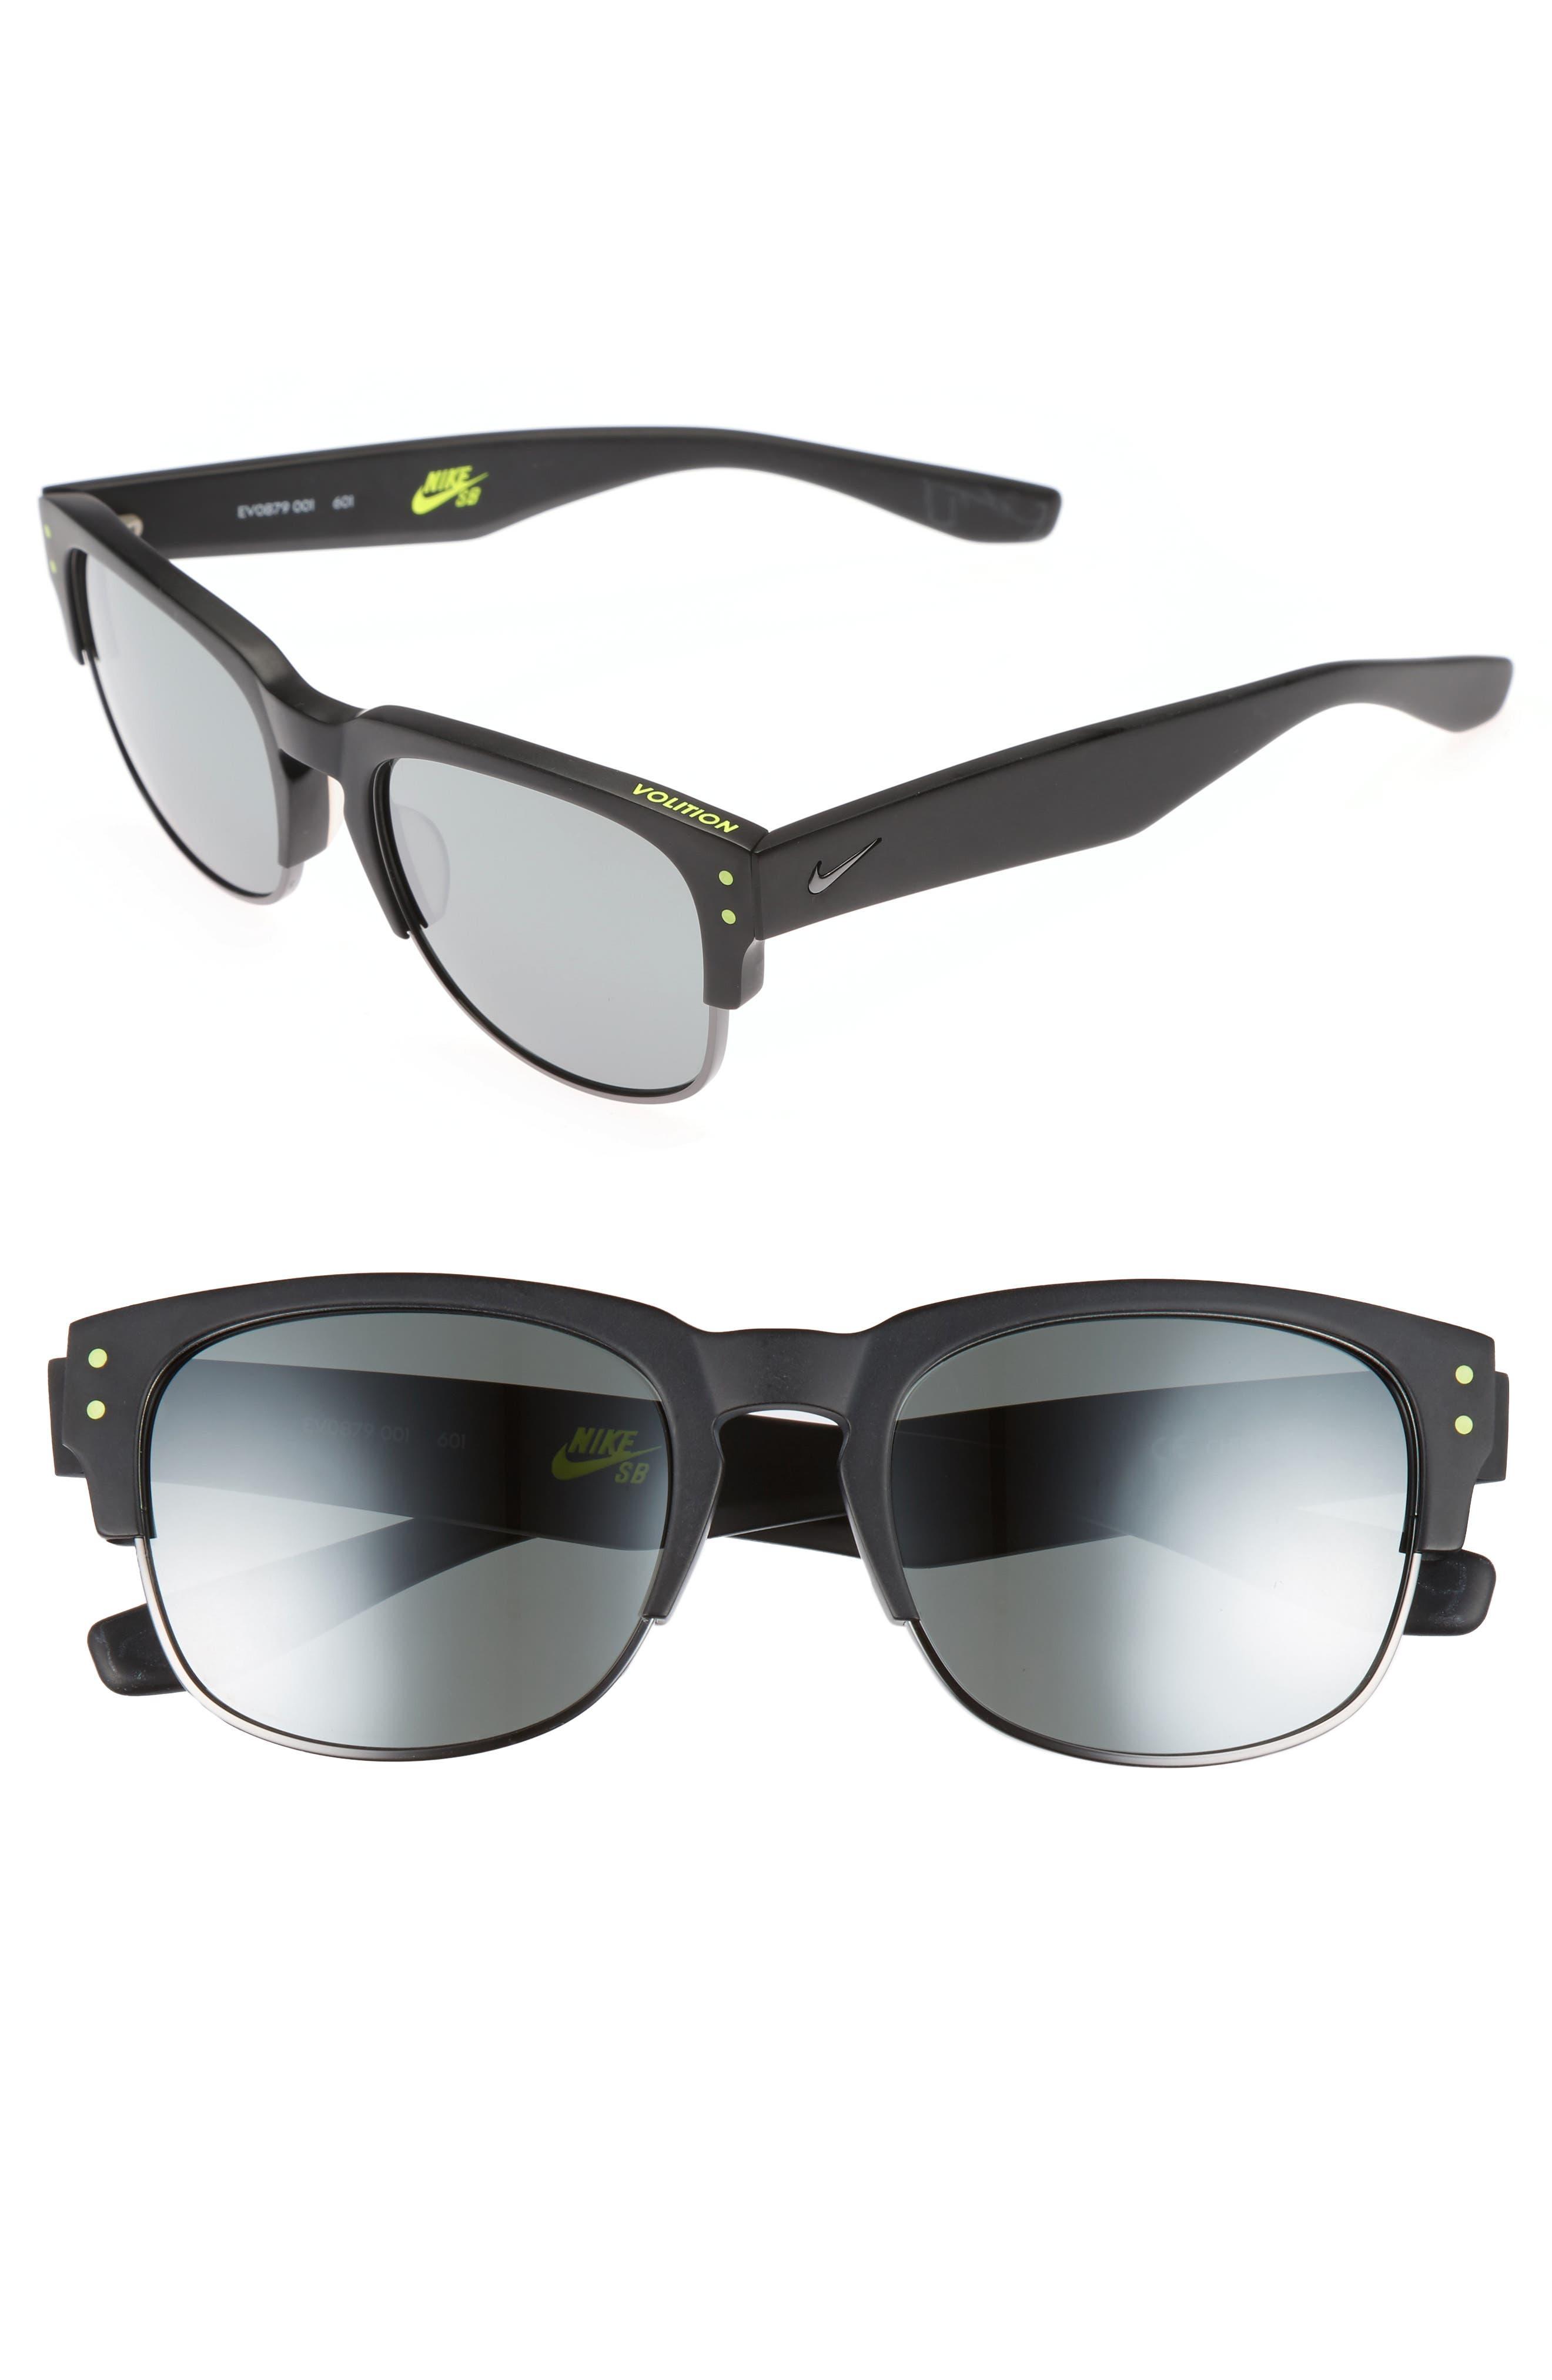 Volition 54mm Sunglasses,                             Main thumbnail 1, color,                             Matte Black/ Gunmetal